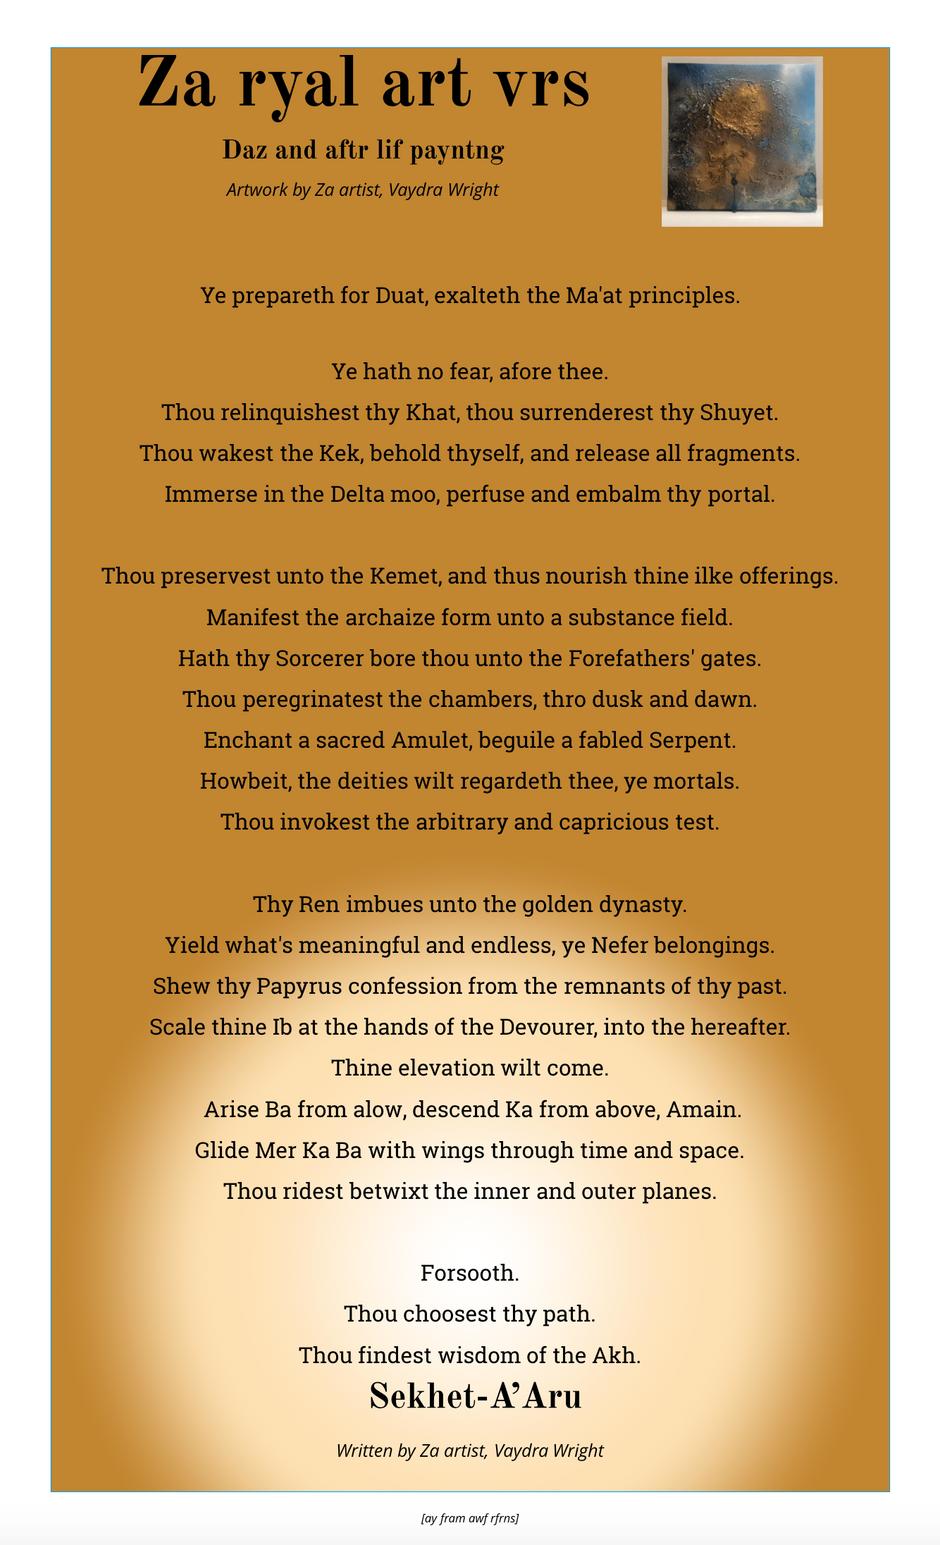 The Royal Art Verse [Za ryal art vrs]